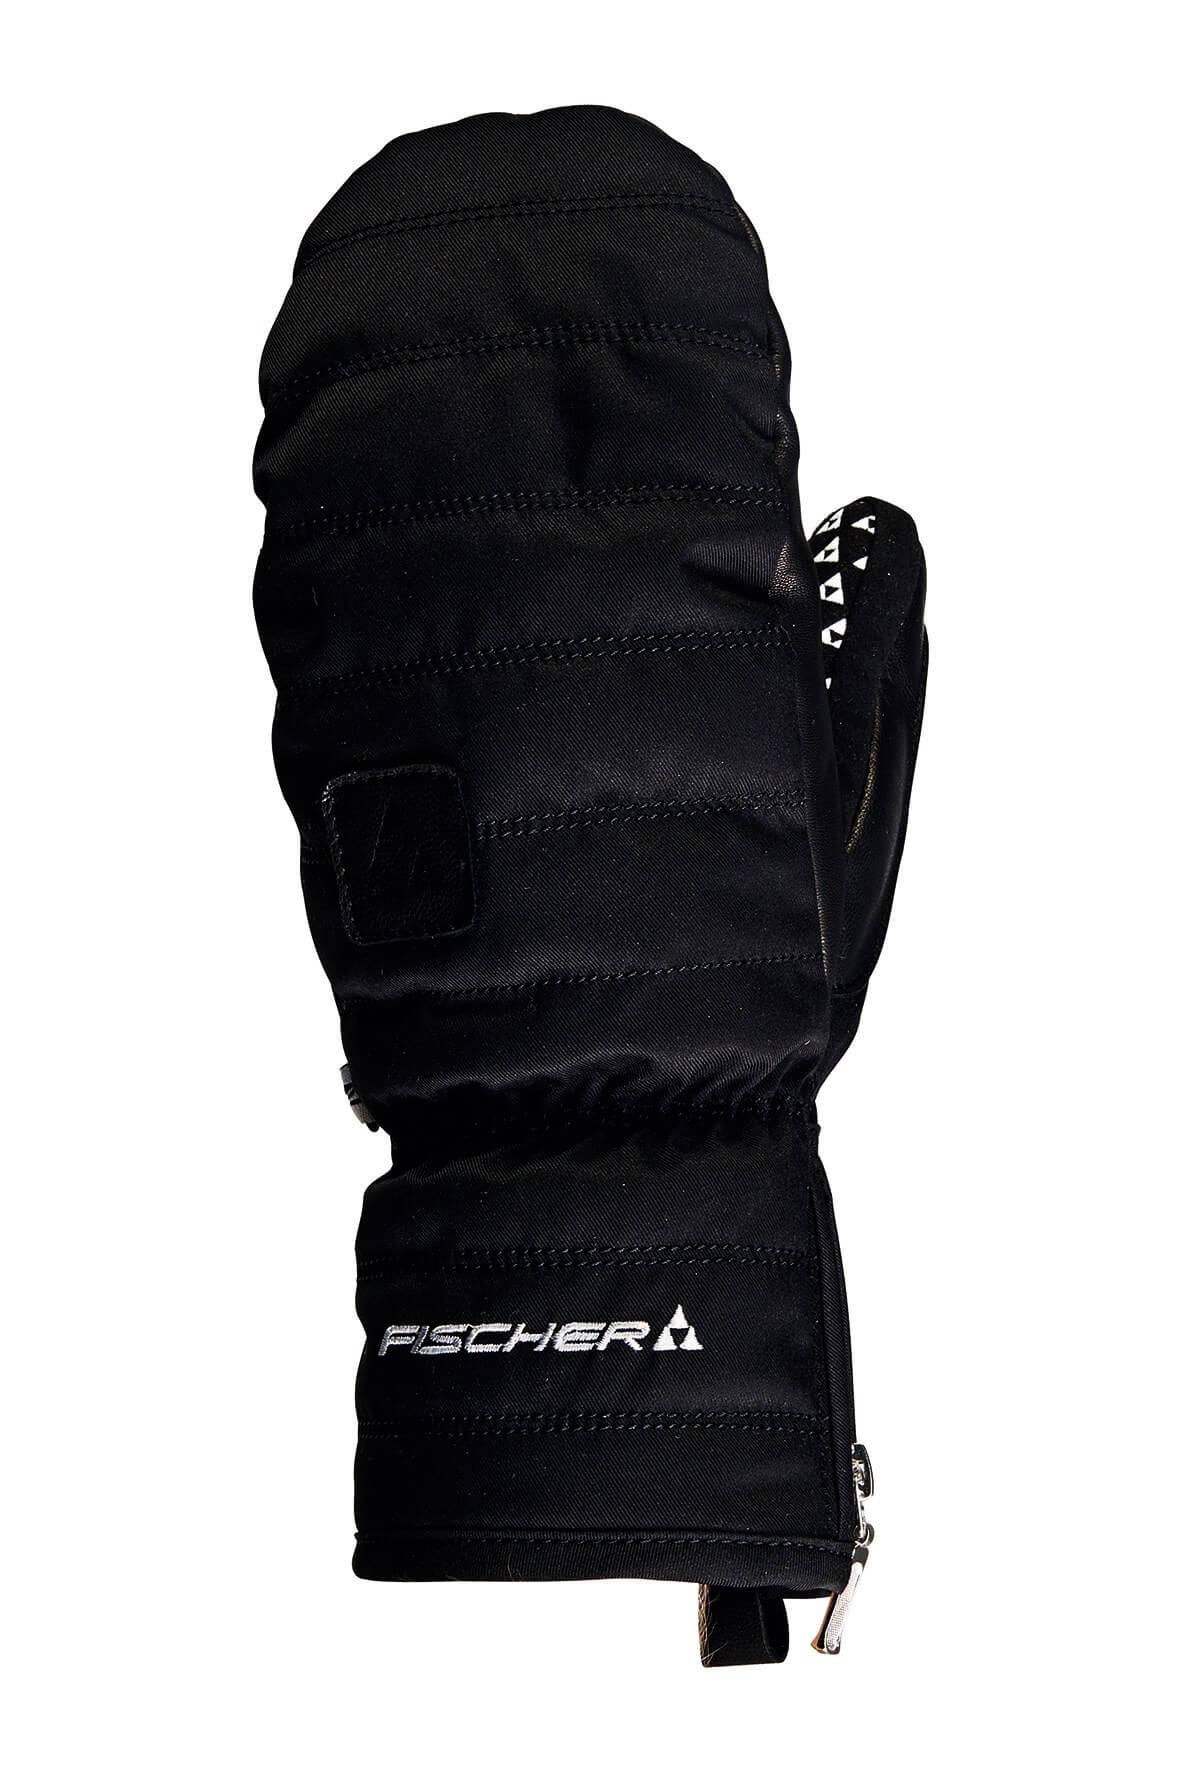 rekawiczki fischer comfort ladies mitten black